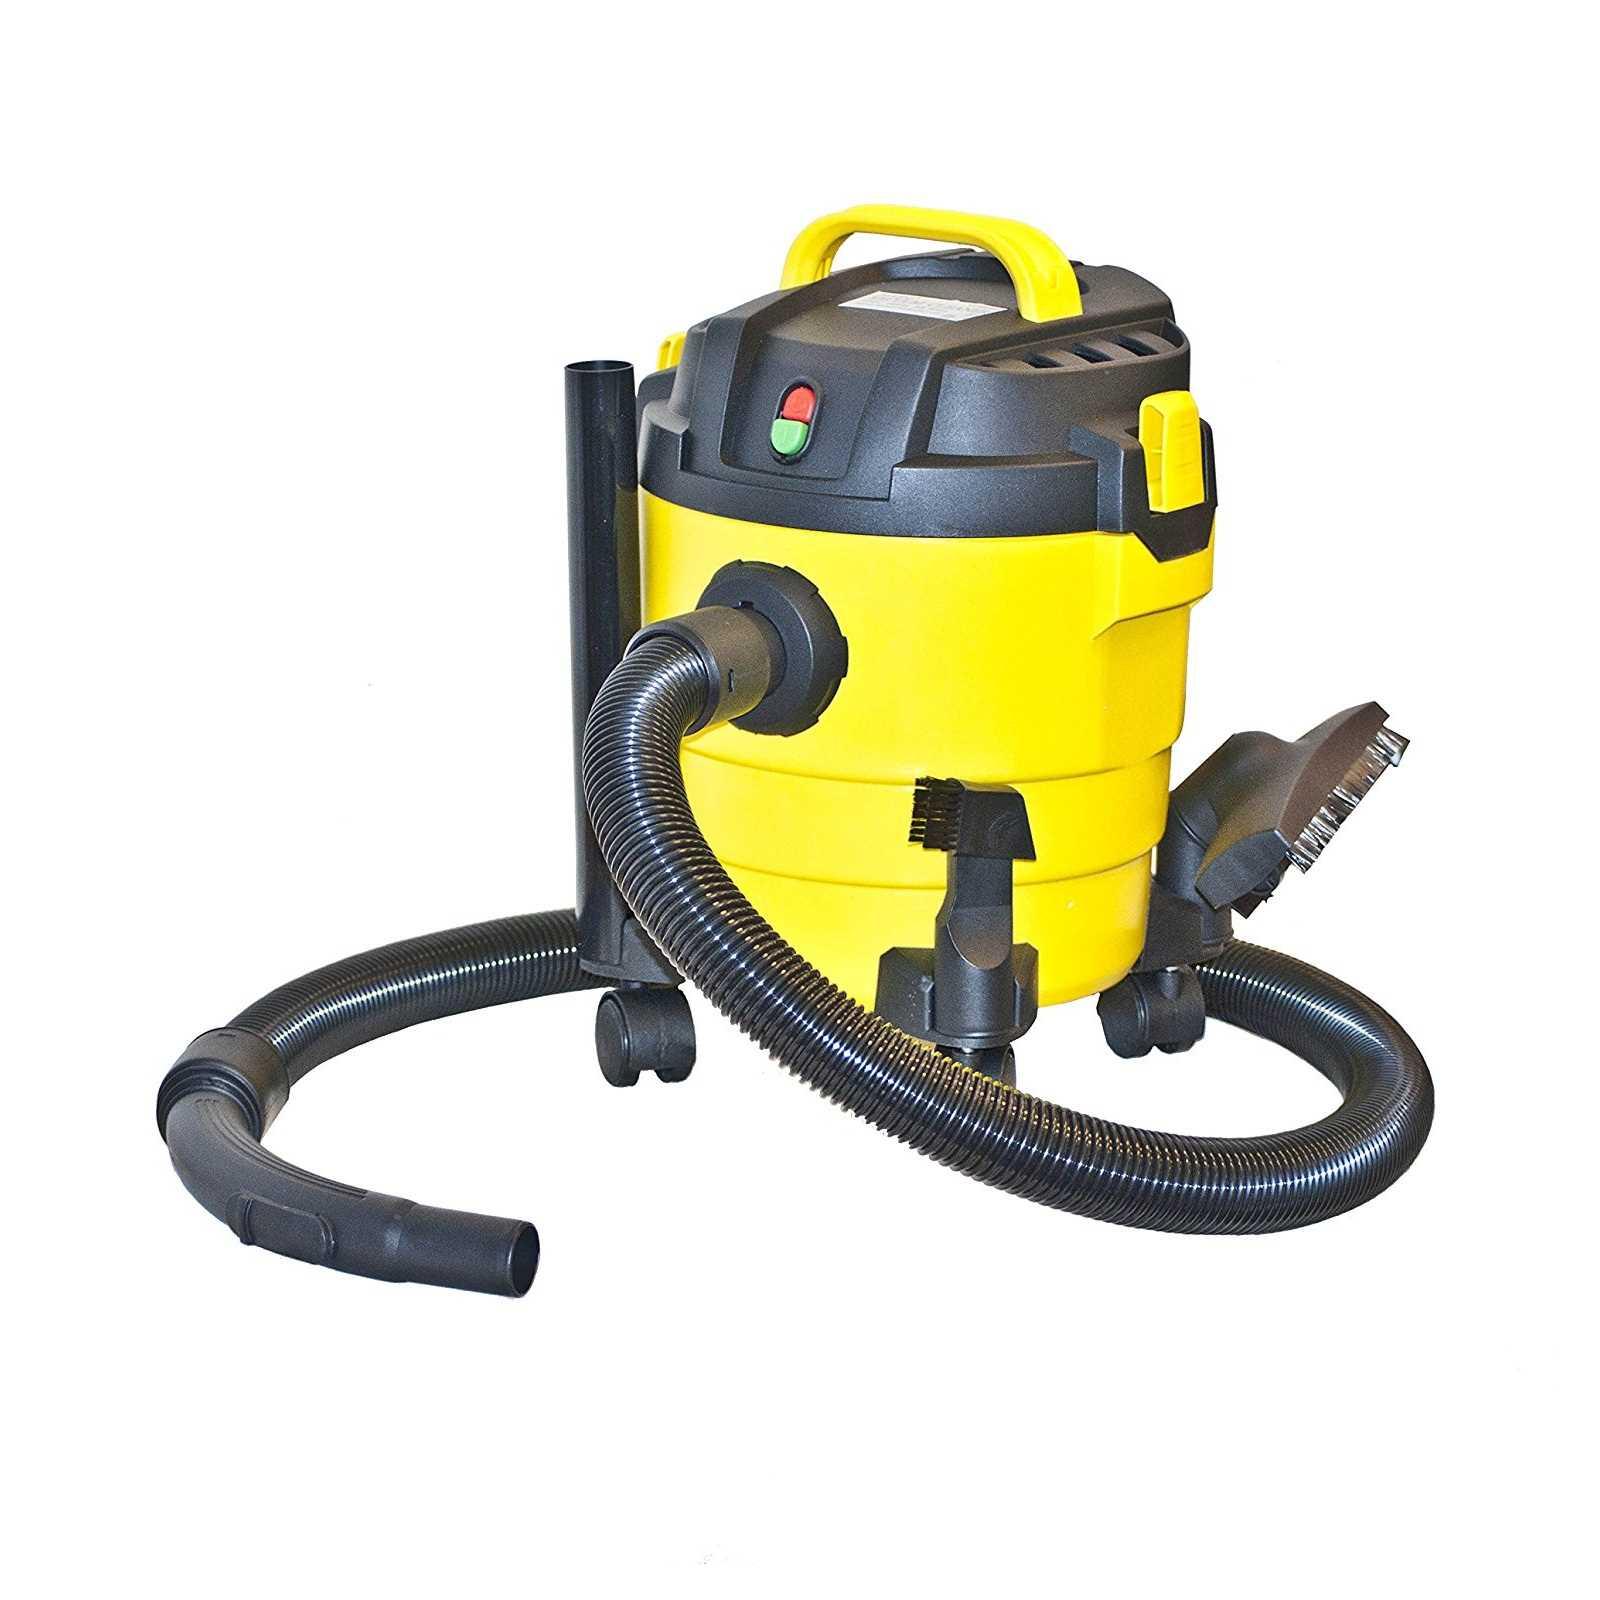 Bosch Aqt 33 11 Car Vacuum Cleaners Price 11 Aug 2019